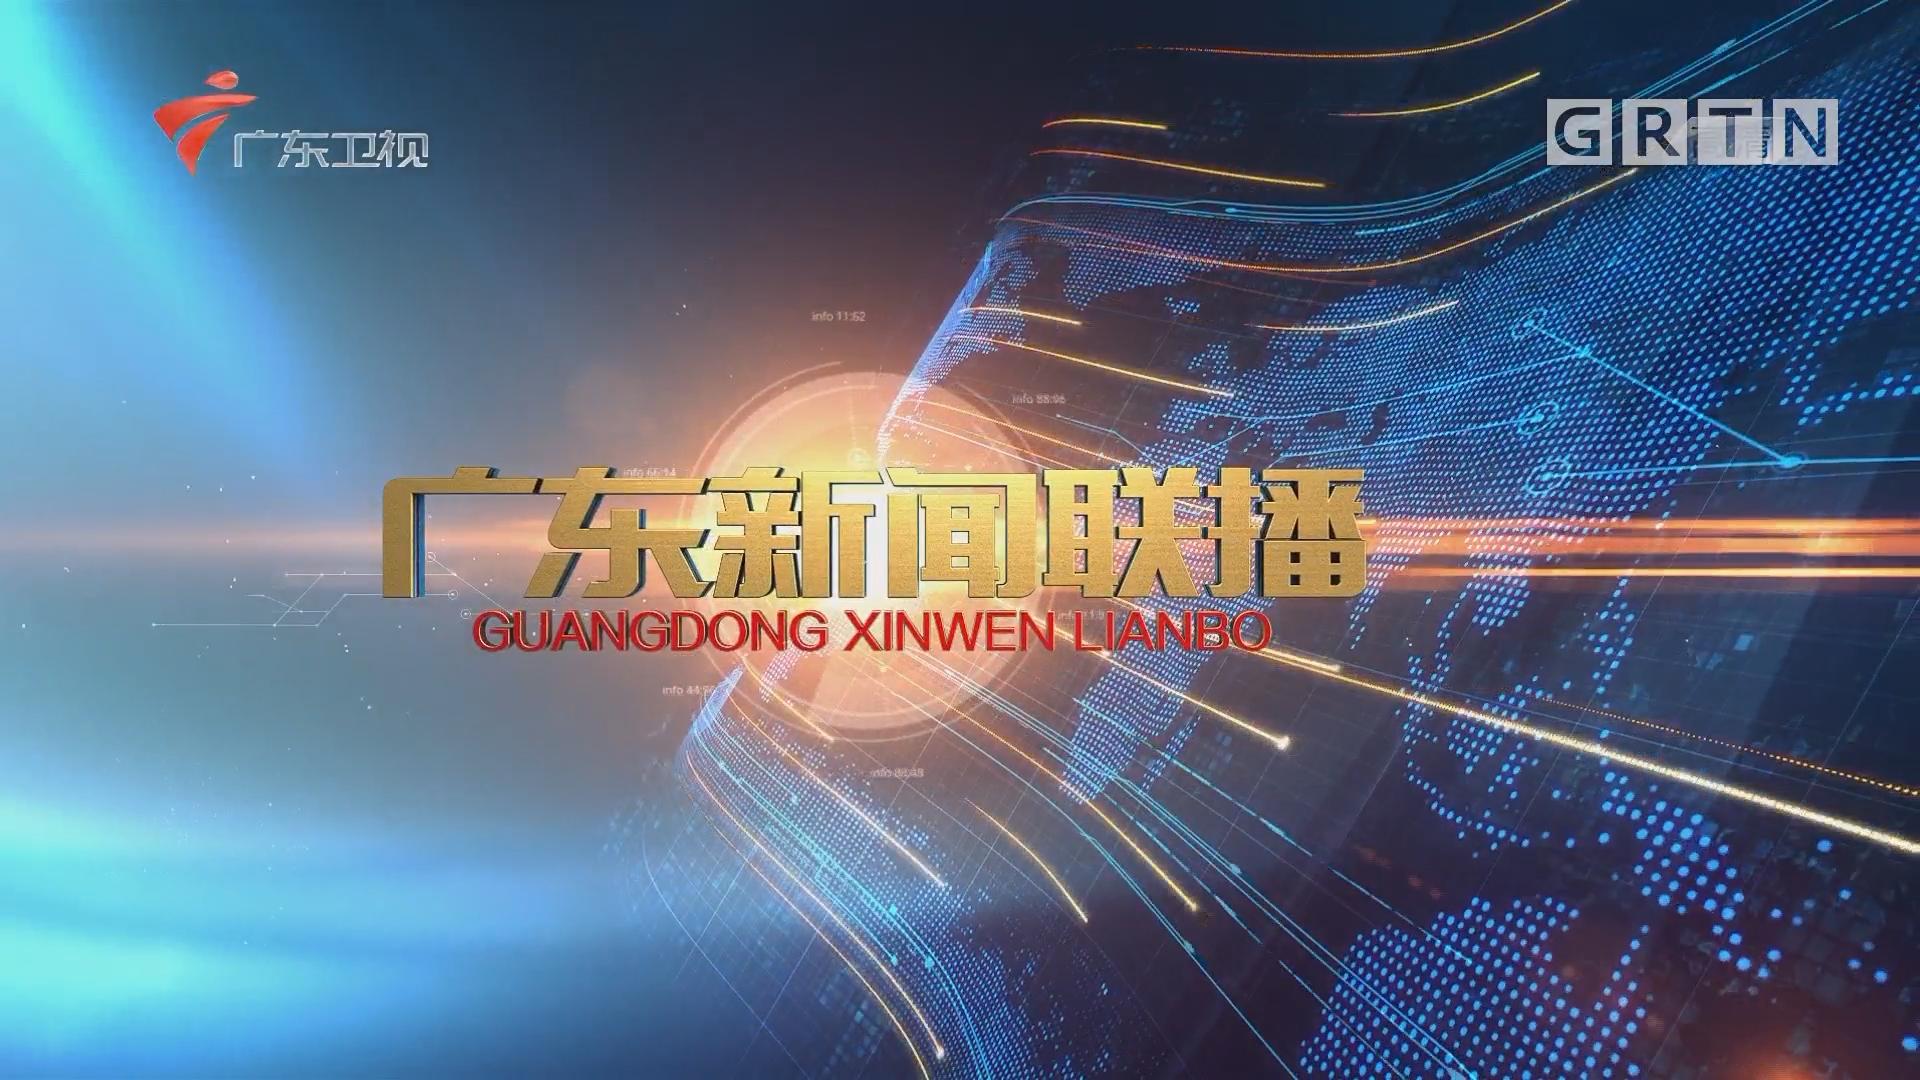 [HD][2019-02-22]广东新闻联播:《粤港澳大湾区发展规划纲要》宣讲会在港举行